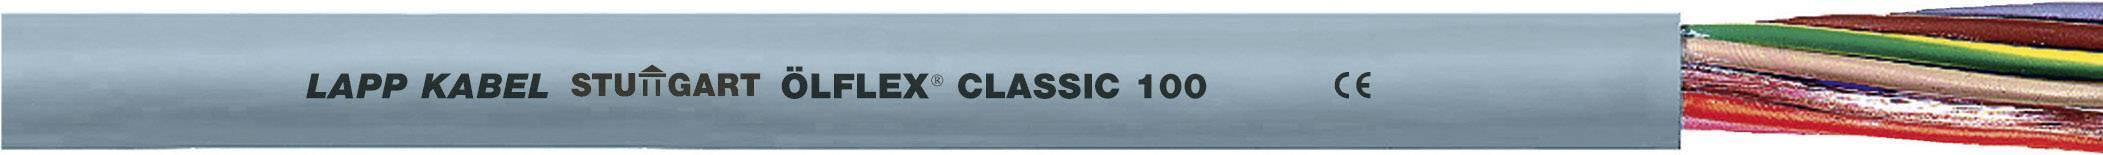 Kabel LappKabel Ölflex CLASSIC 100 8G0,75 (0010027), PVC, 8,8 mm, 500 V, šedá, 100 m